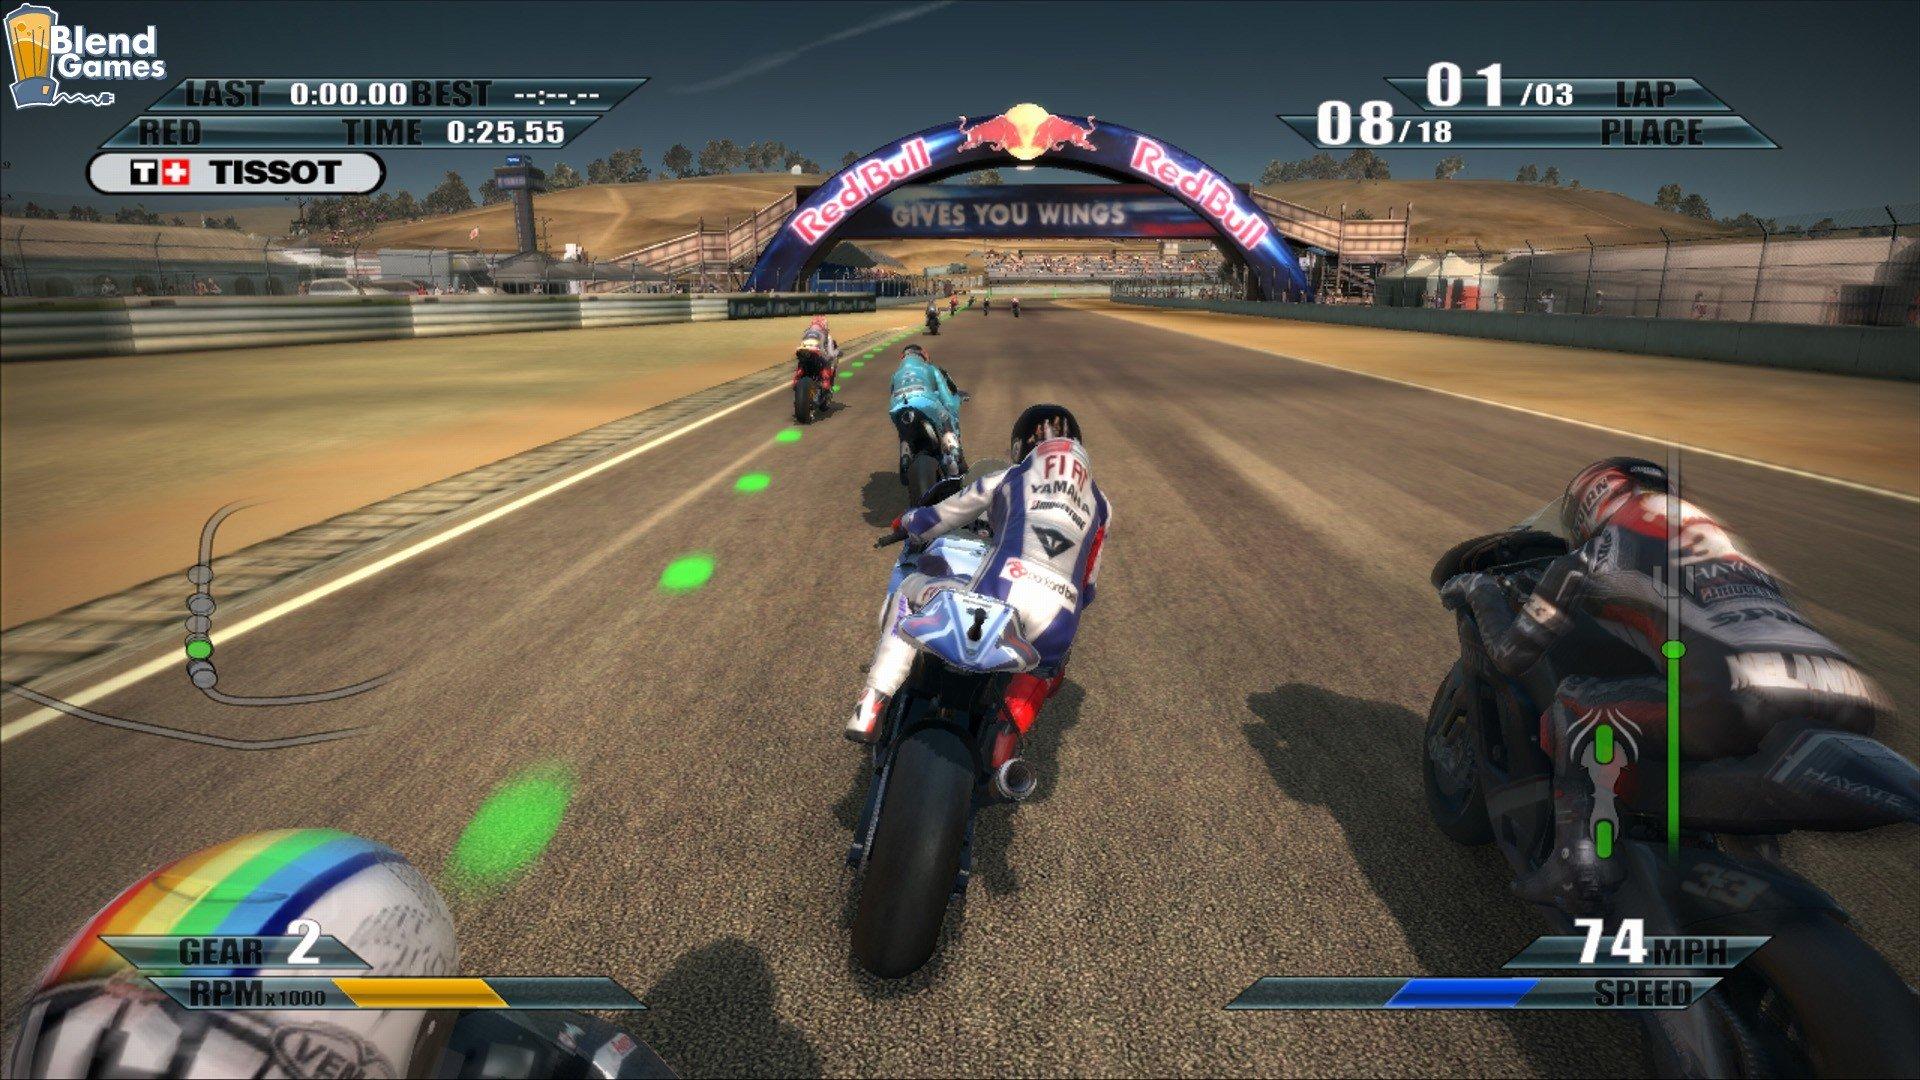 Motogp 09 10 Xbox 360 And Ps3 Hd Screenshots Demo And Dlc